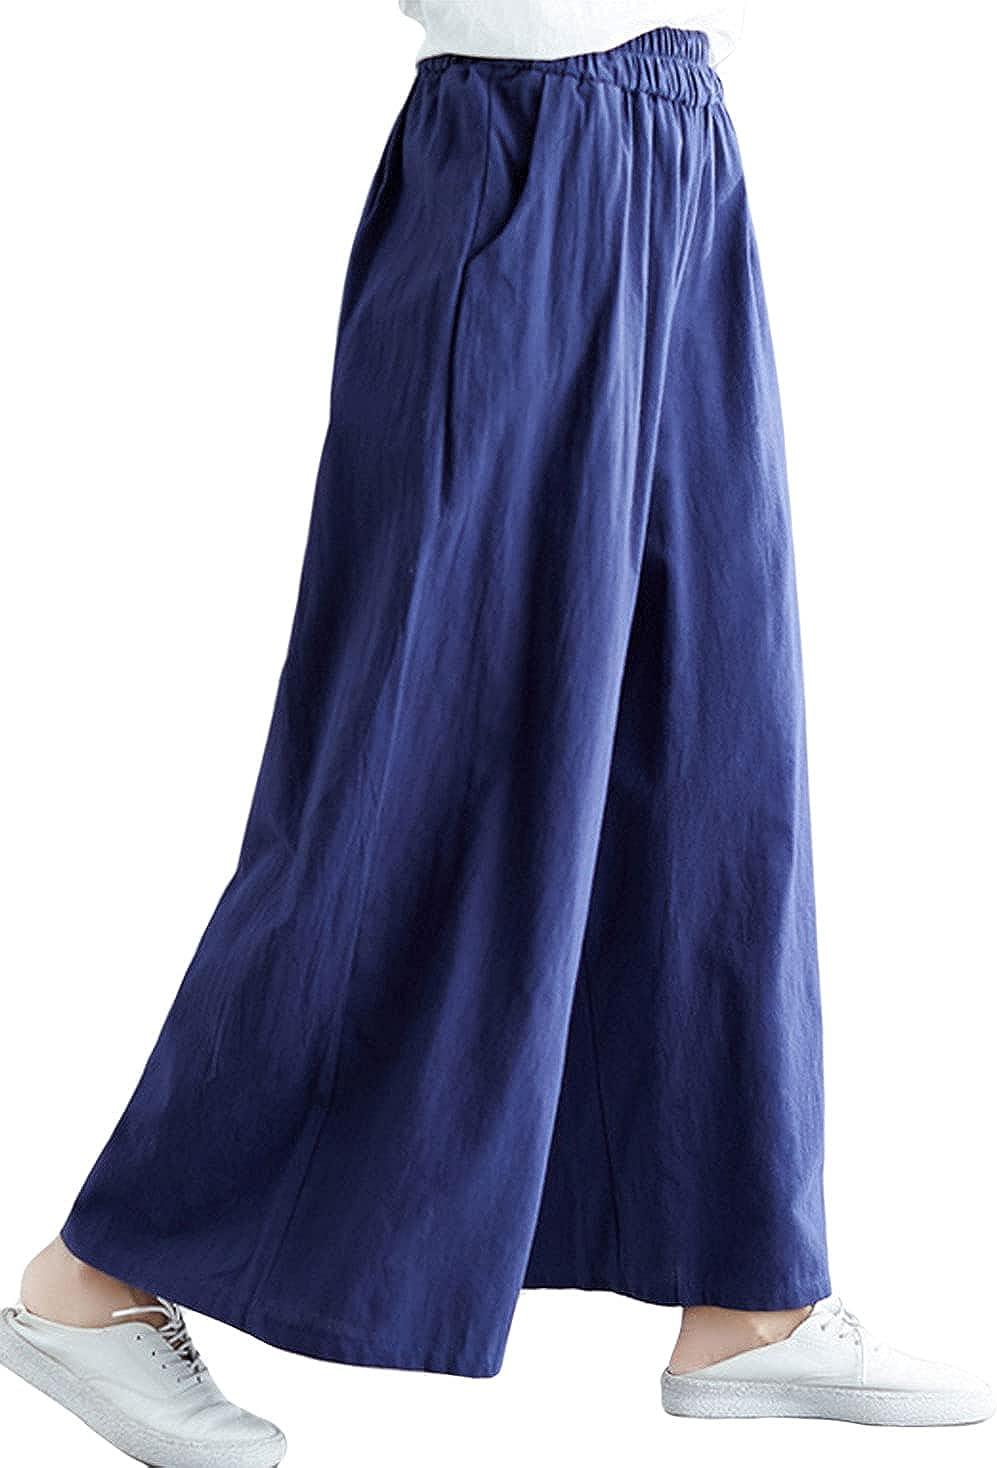 CHARTOU Women's Cotton Linen Elastic Waist Palazzo Wide Leg Lounge Pants with Pockets